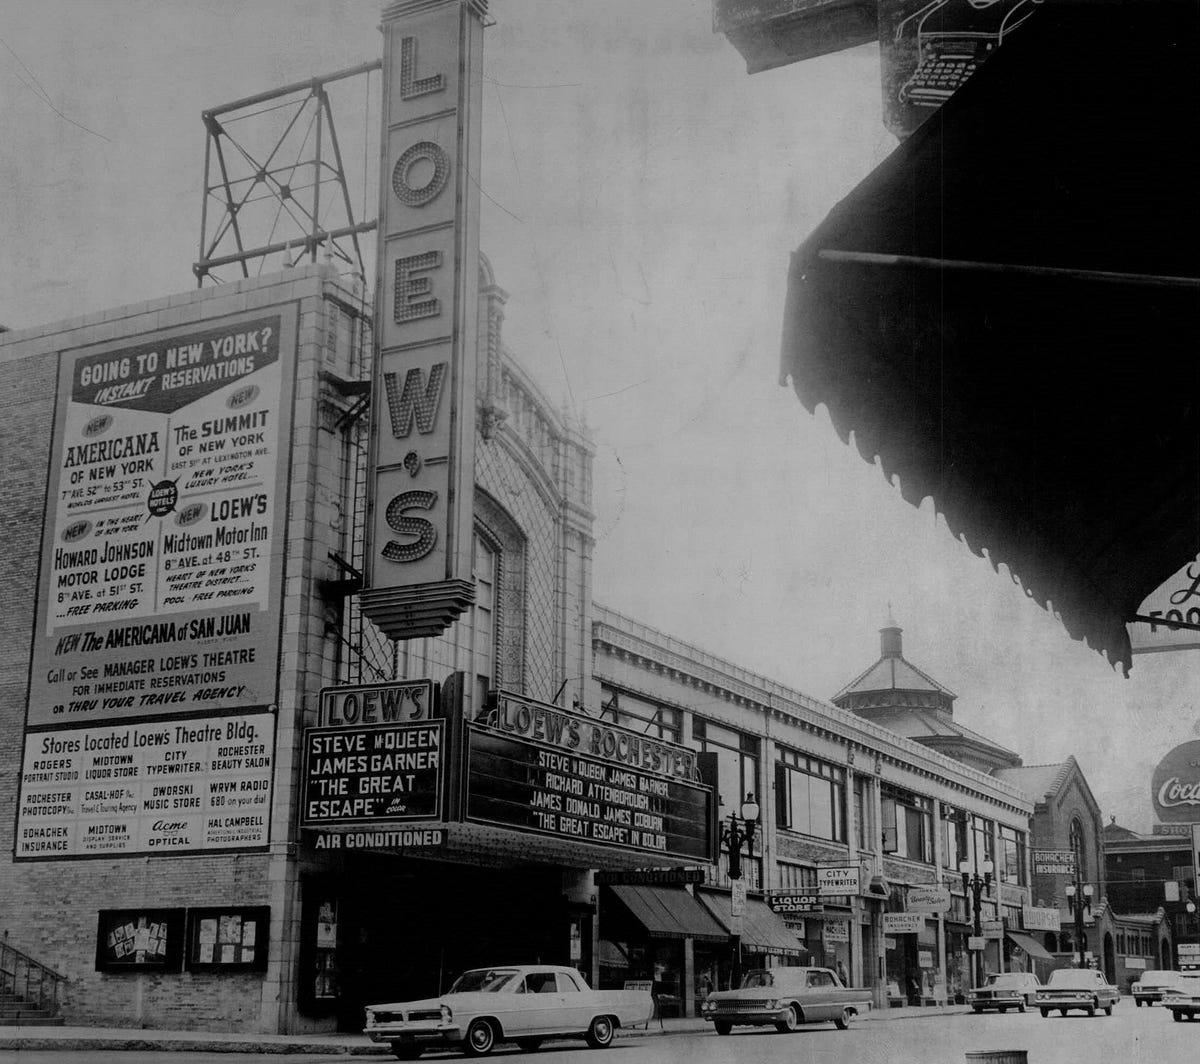 Whatever Happened To     neighborhood movie theaters?